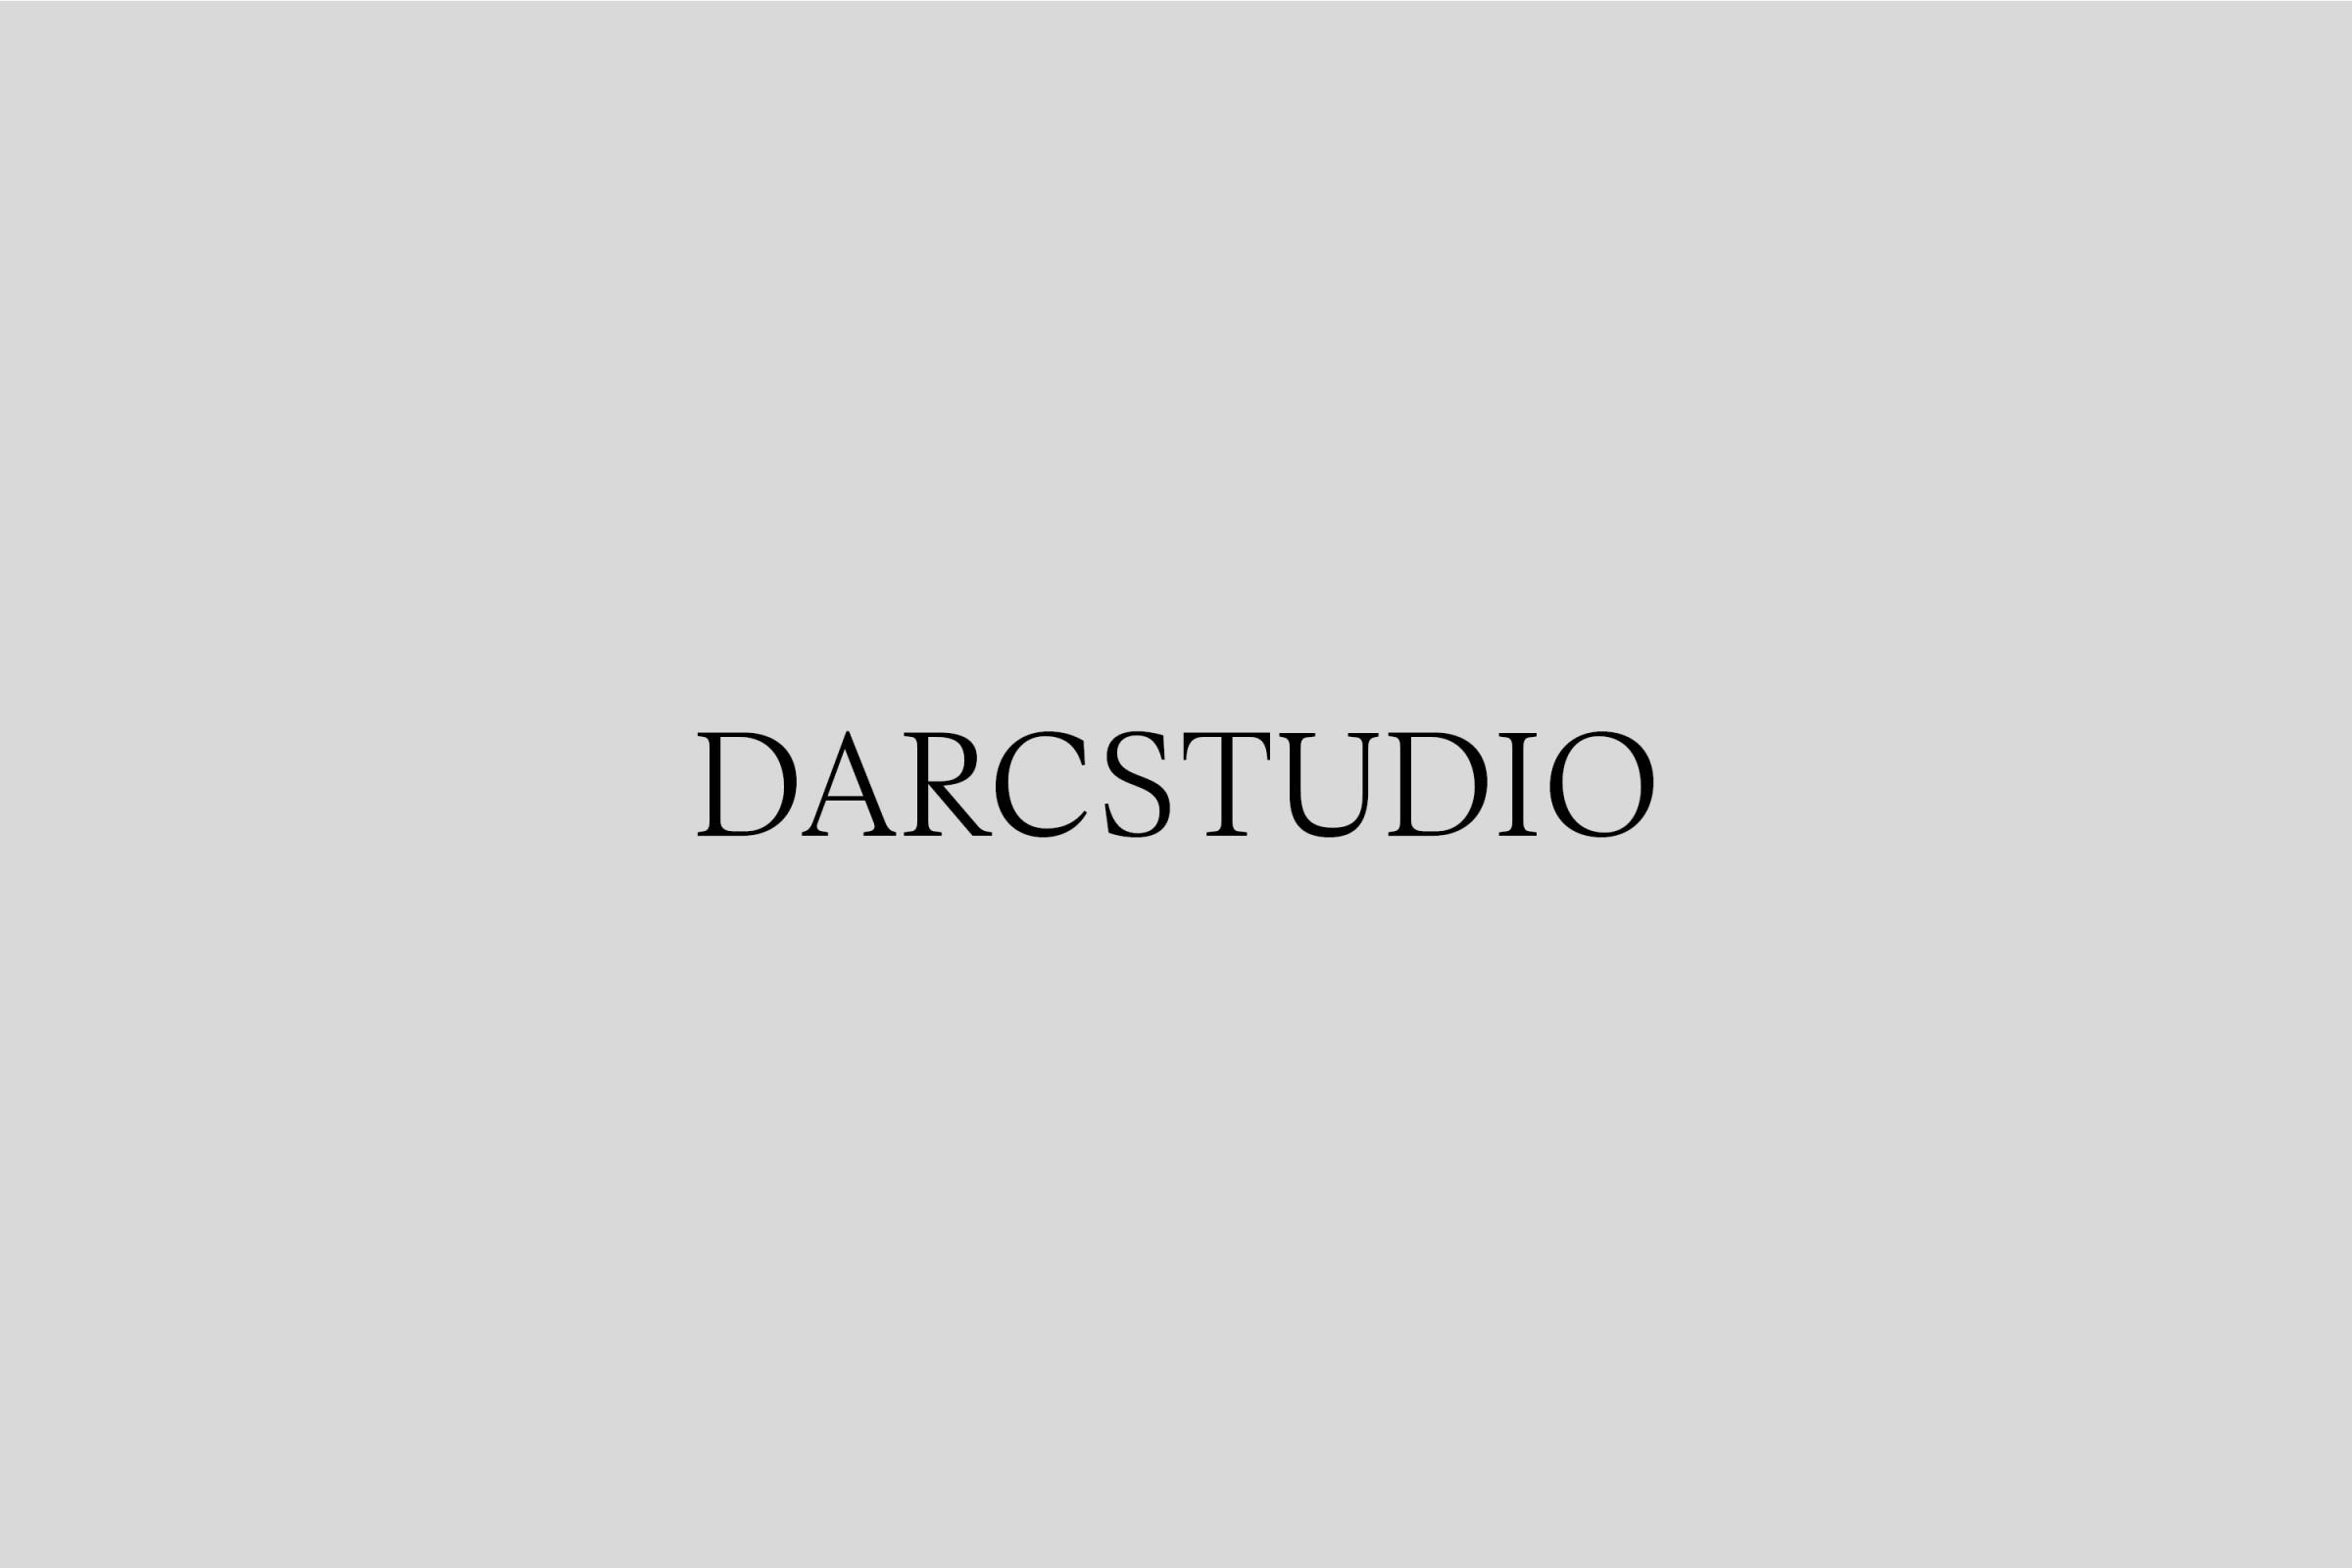 WeShouldDoItAll — Darcstudio